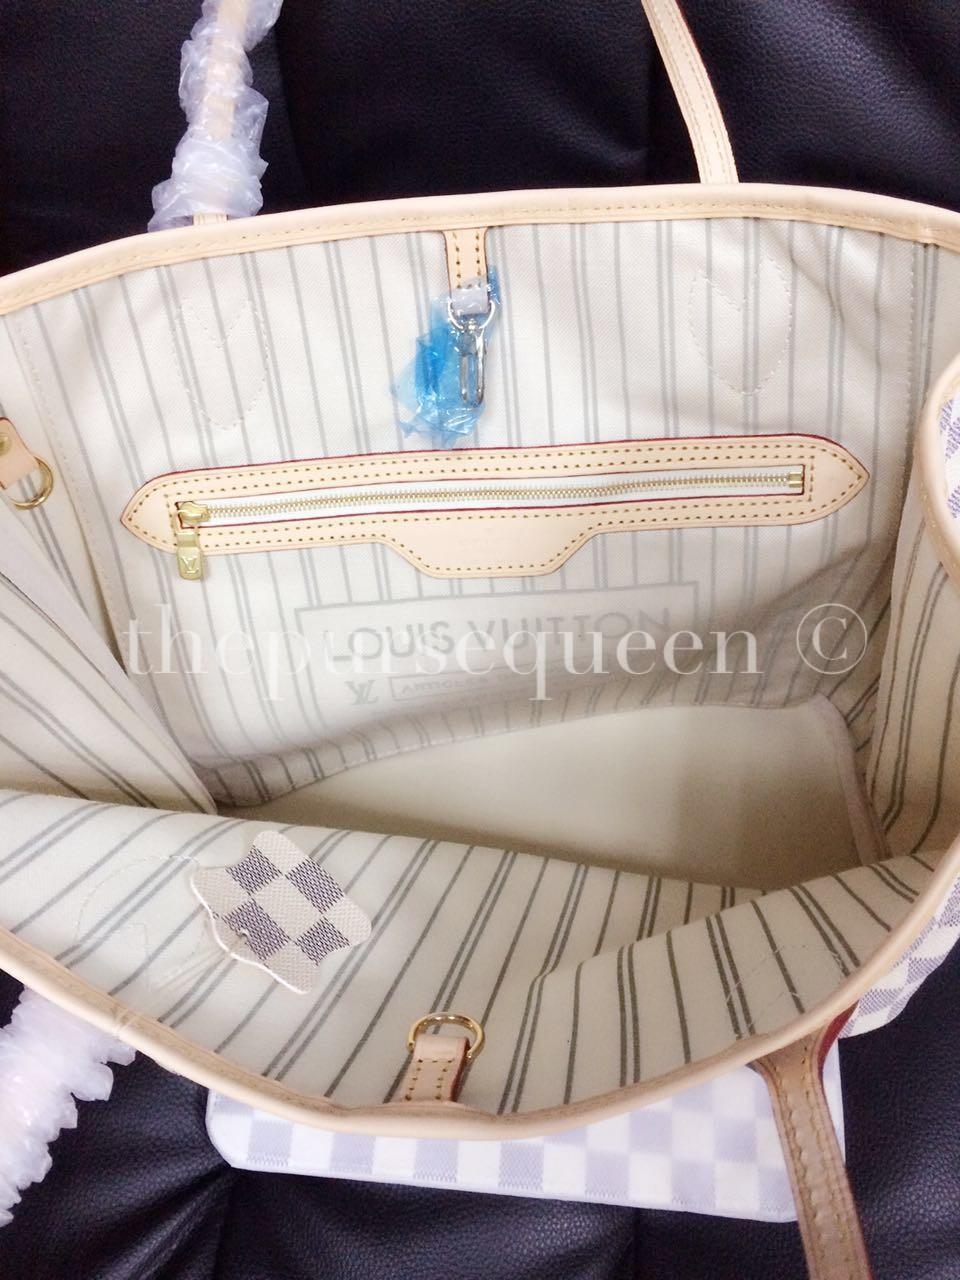 de9000ea52 Louis Vuitton Neverfull Replica - Damier Azur - Authentic   Replica ...